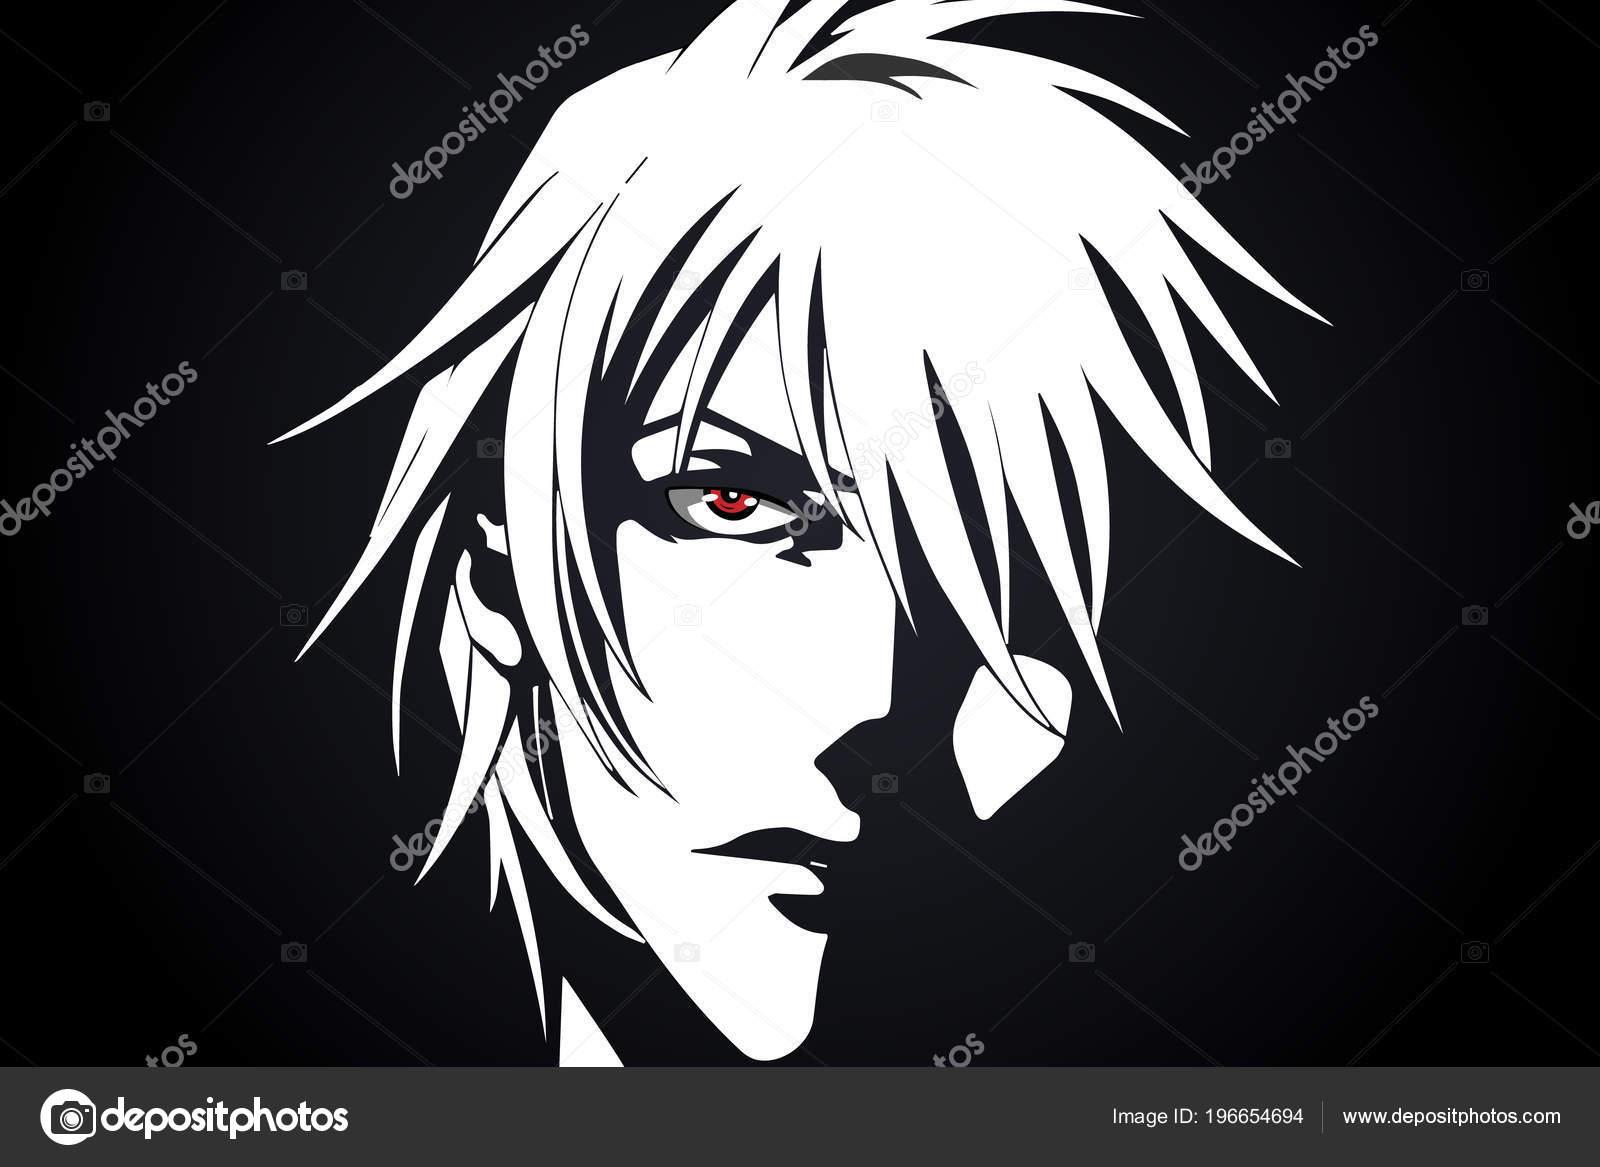 Anime Face Cartoon Anime Red Eyes Black White Background